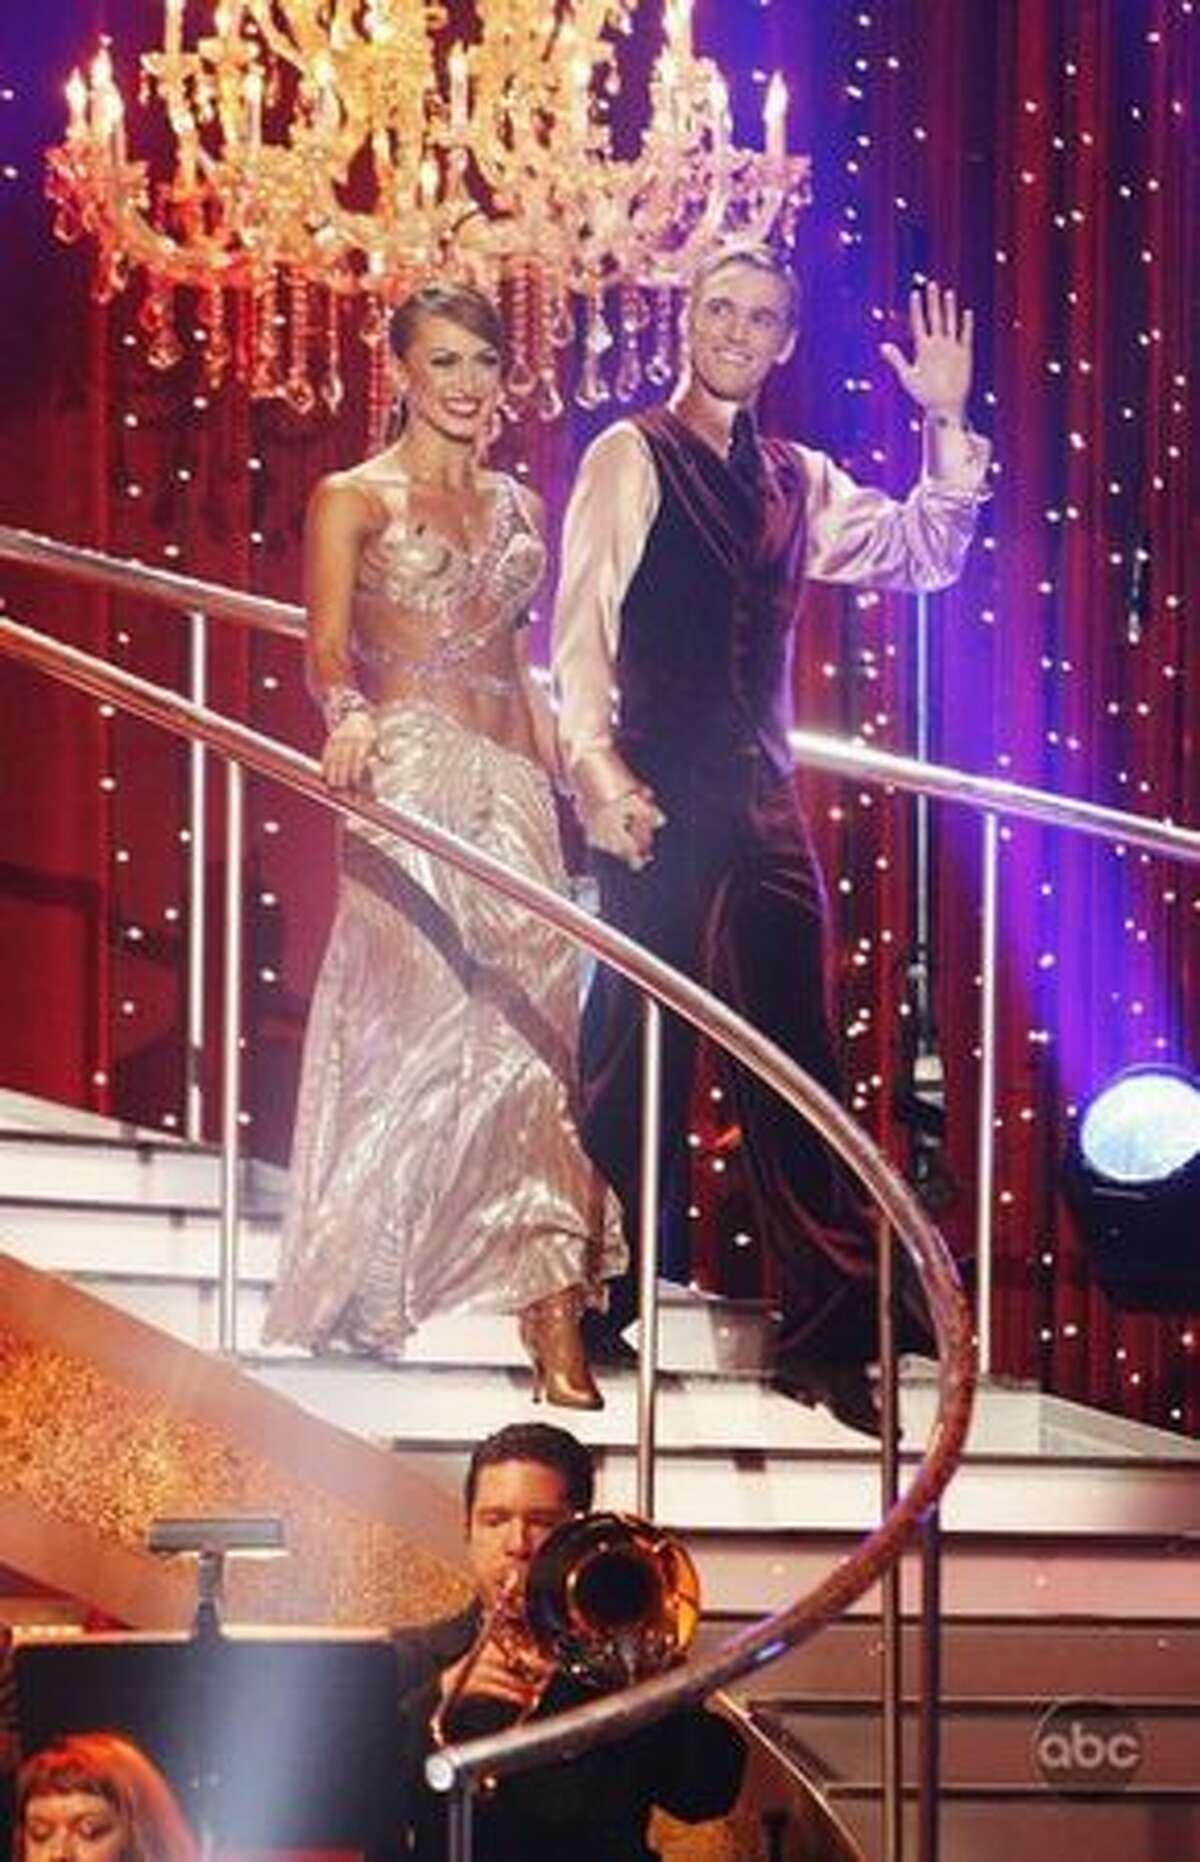 Professional dancer Karina Smirnoff and singer Aaron Carter are introduced.